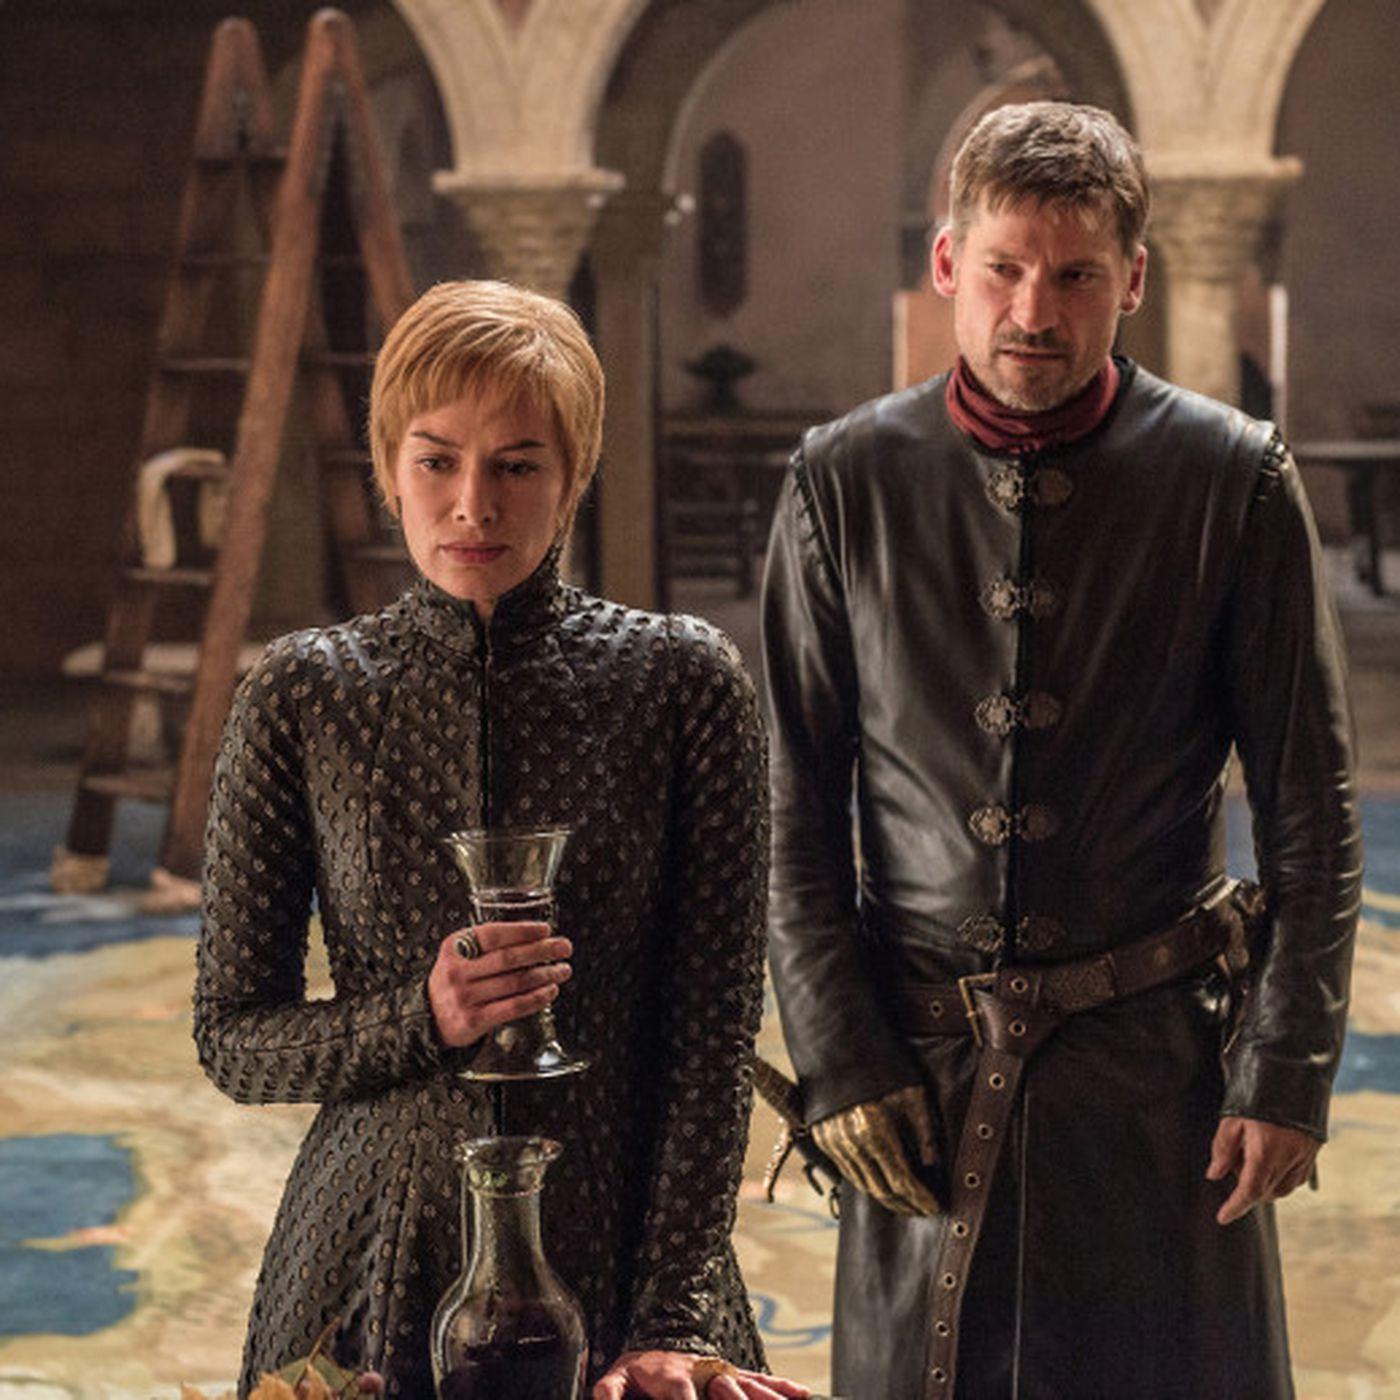 Game of Thrones season 8, episode 5: Jaime will definitely kill